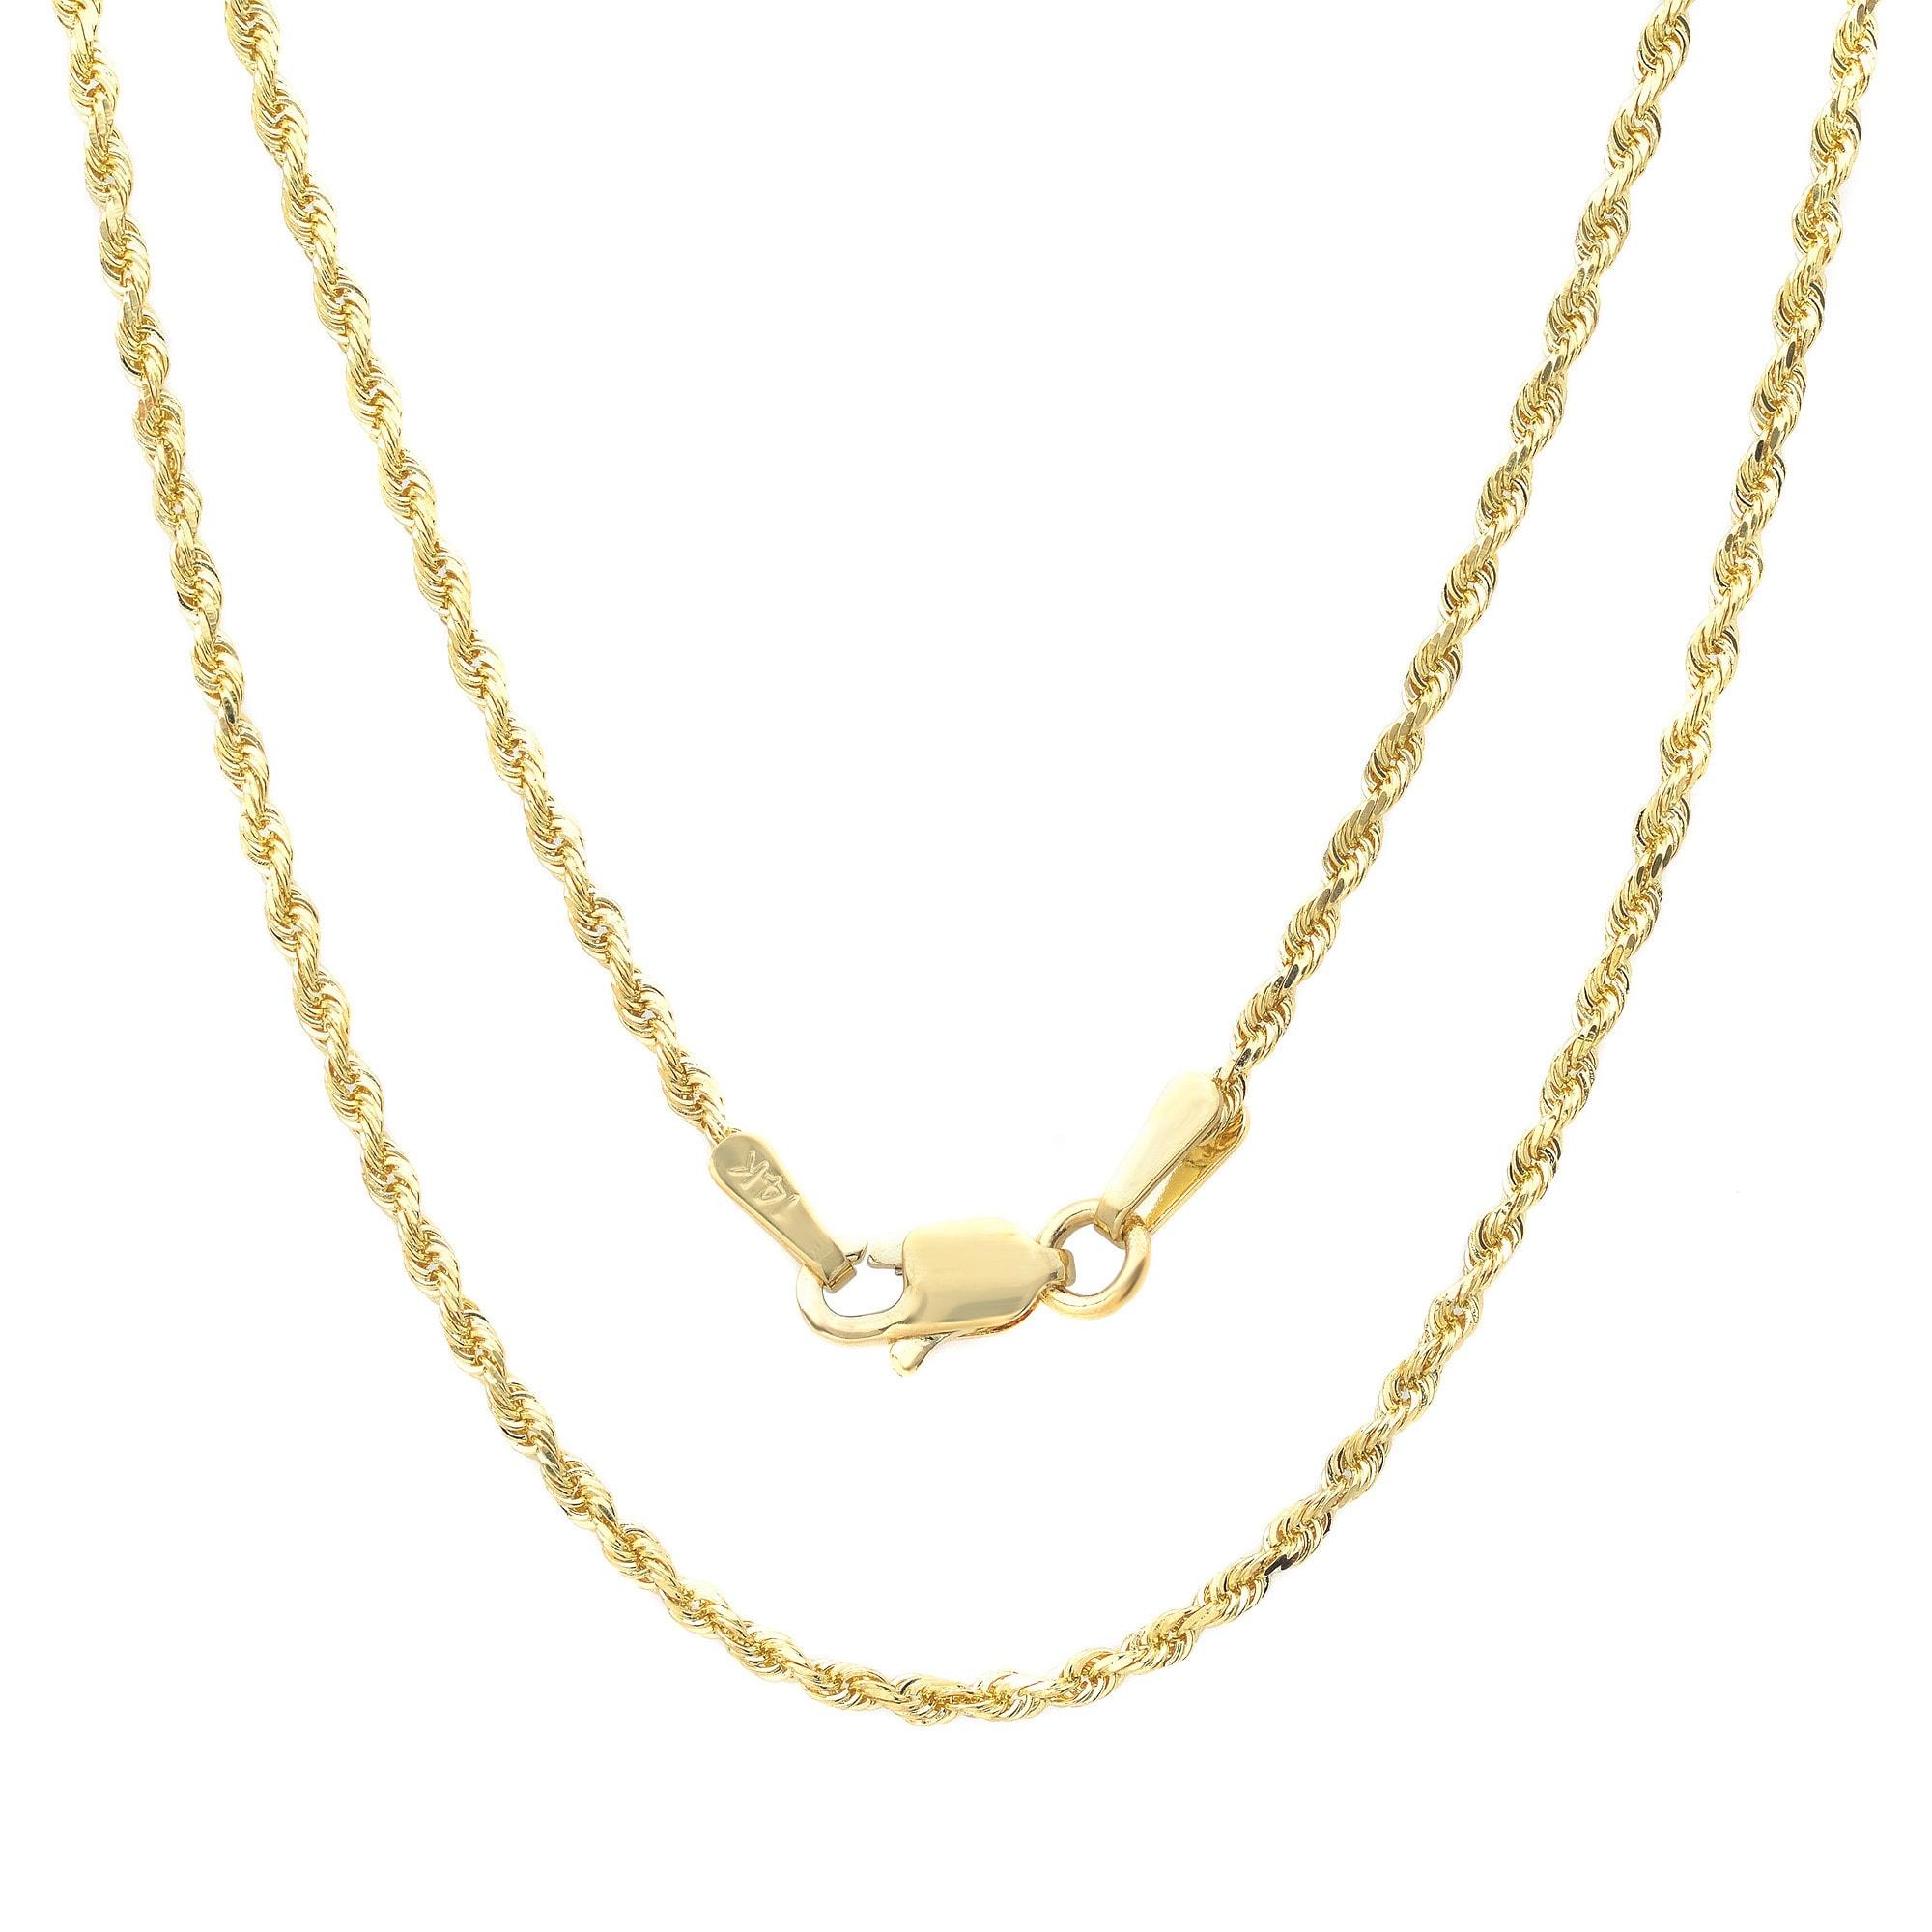 682eabfbe01ae Roberto Martinez 14k Yellow Gold 1.5mm Rope Chain Necklace